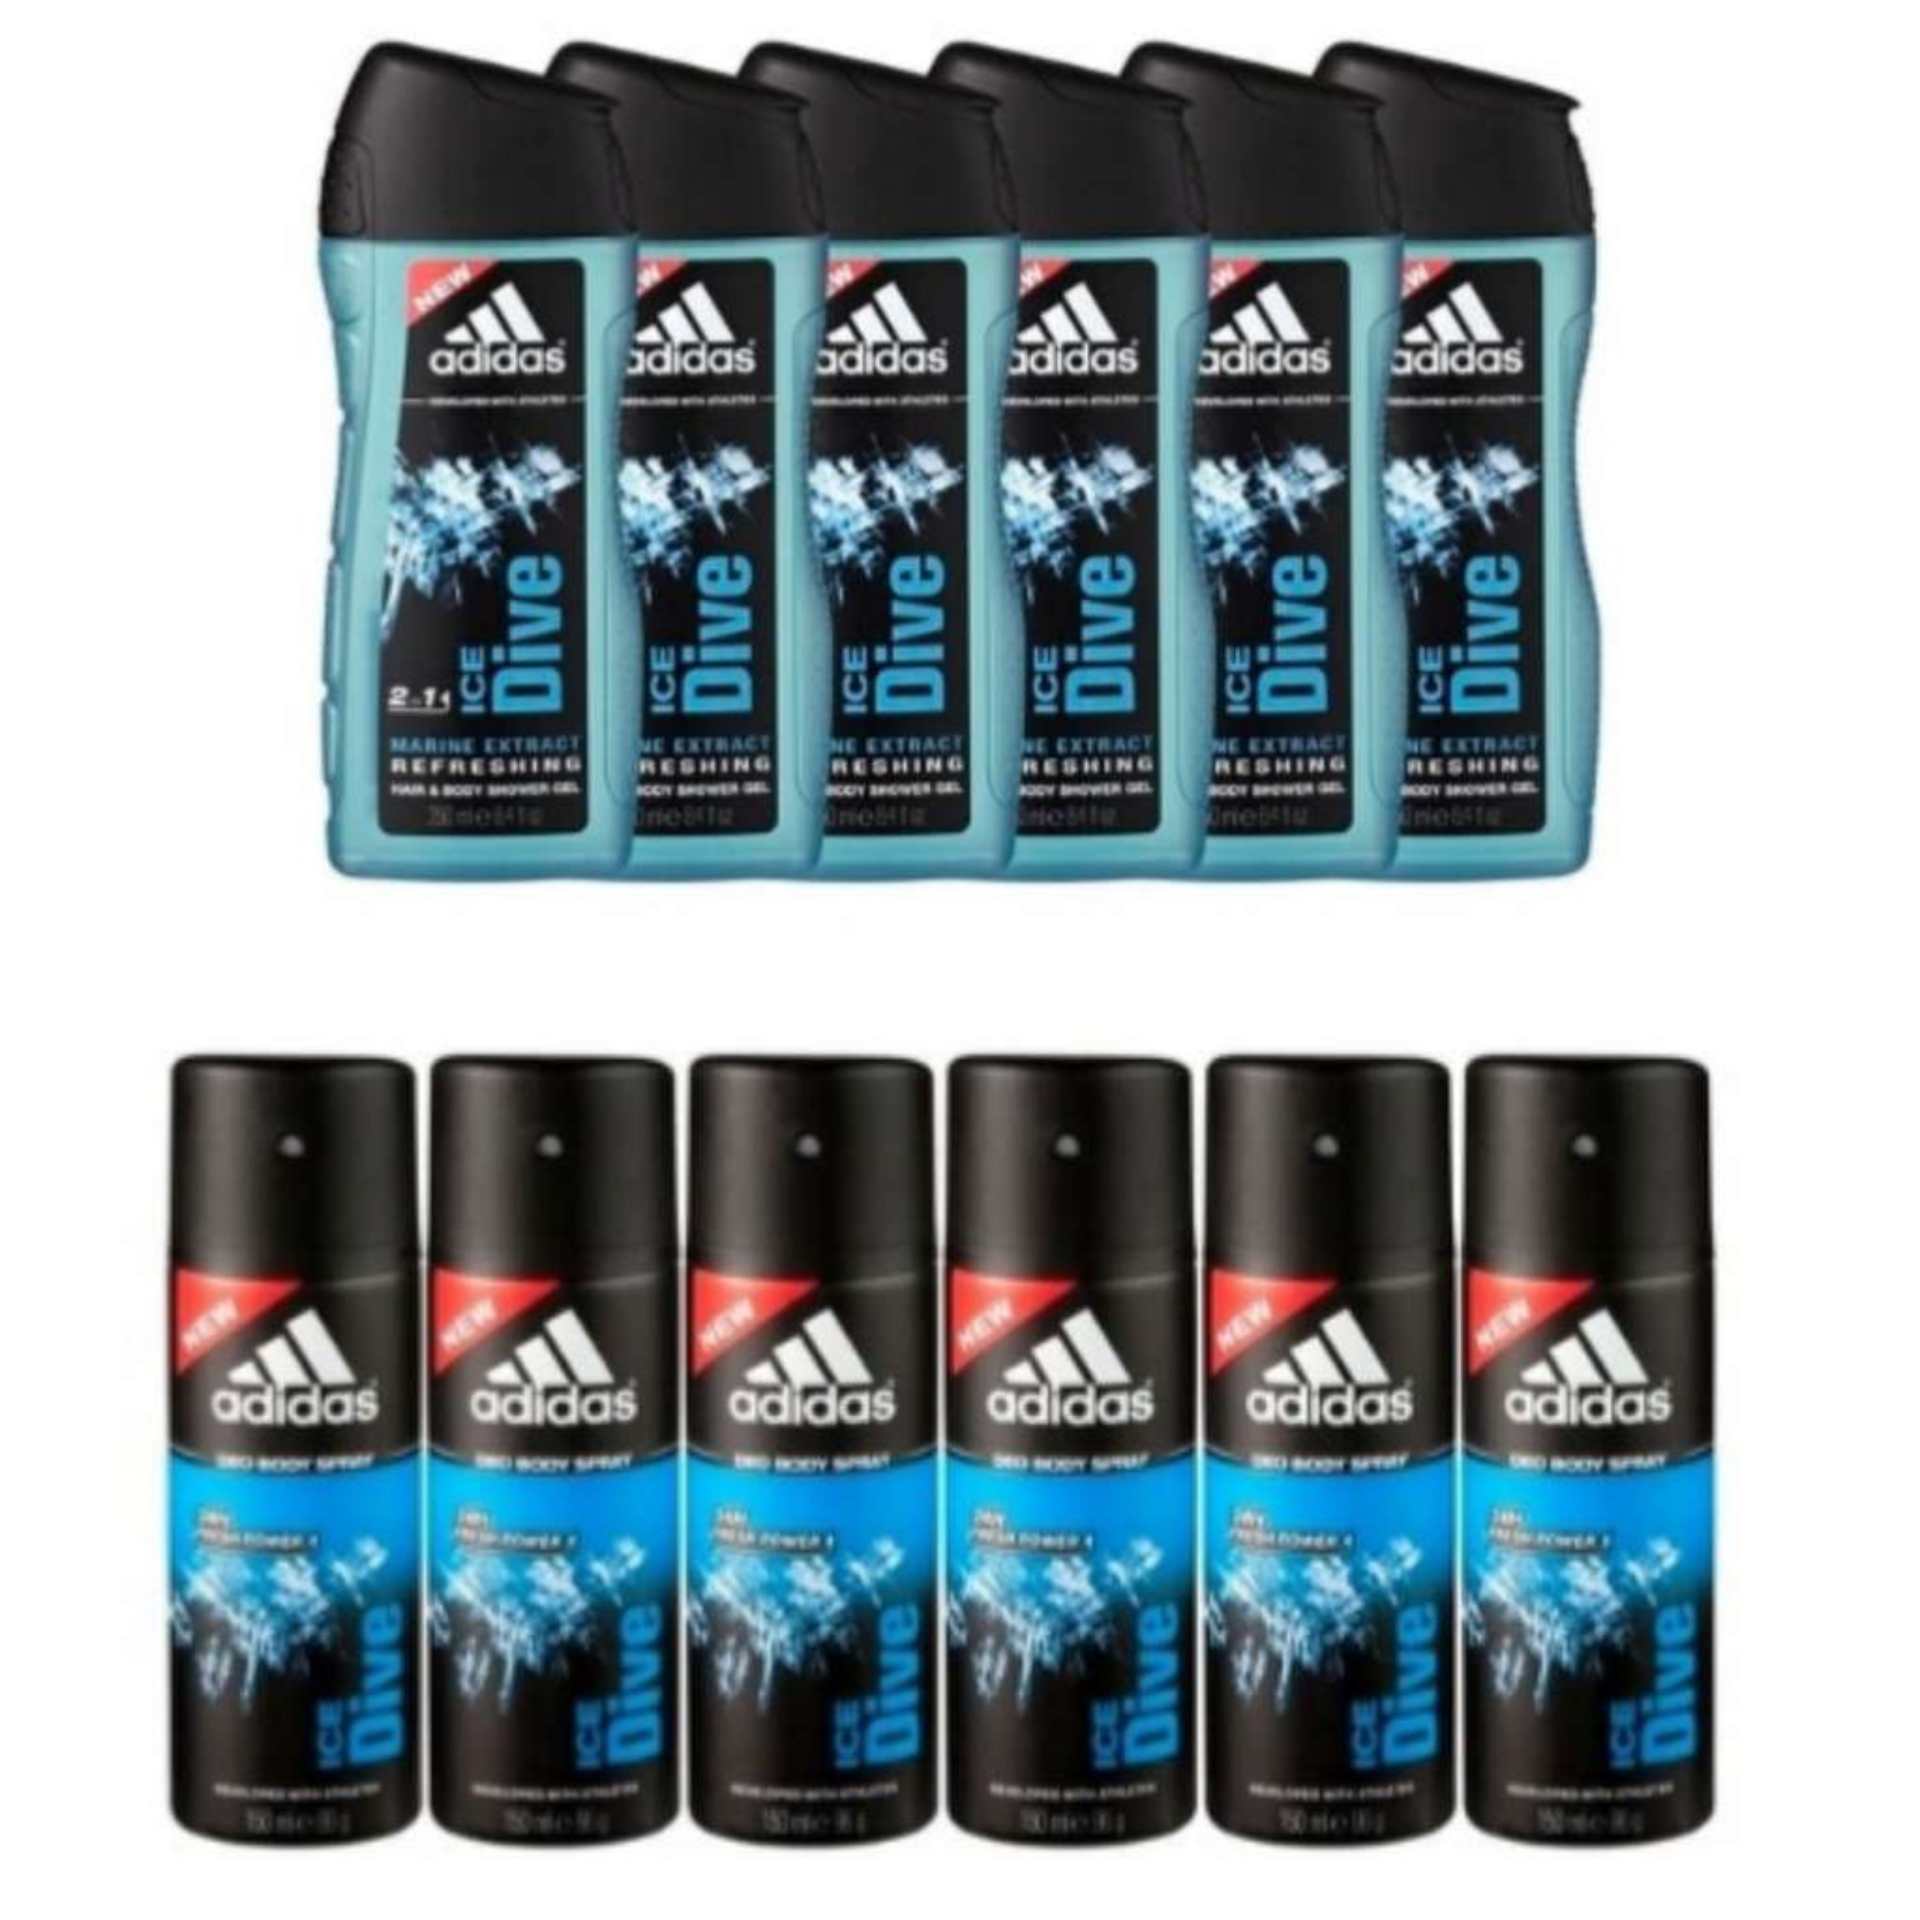 5f215f9553b 6 x 250ml Adidas douche of deodorant voor €6,00 (€1,00 per stuk!!) @Kruidvat  - Pepper.com